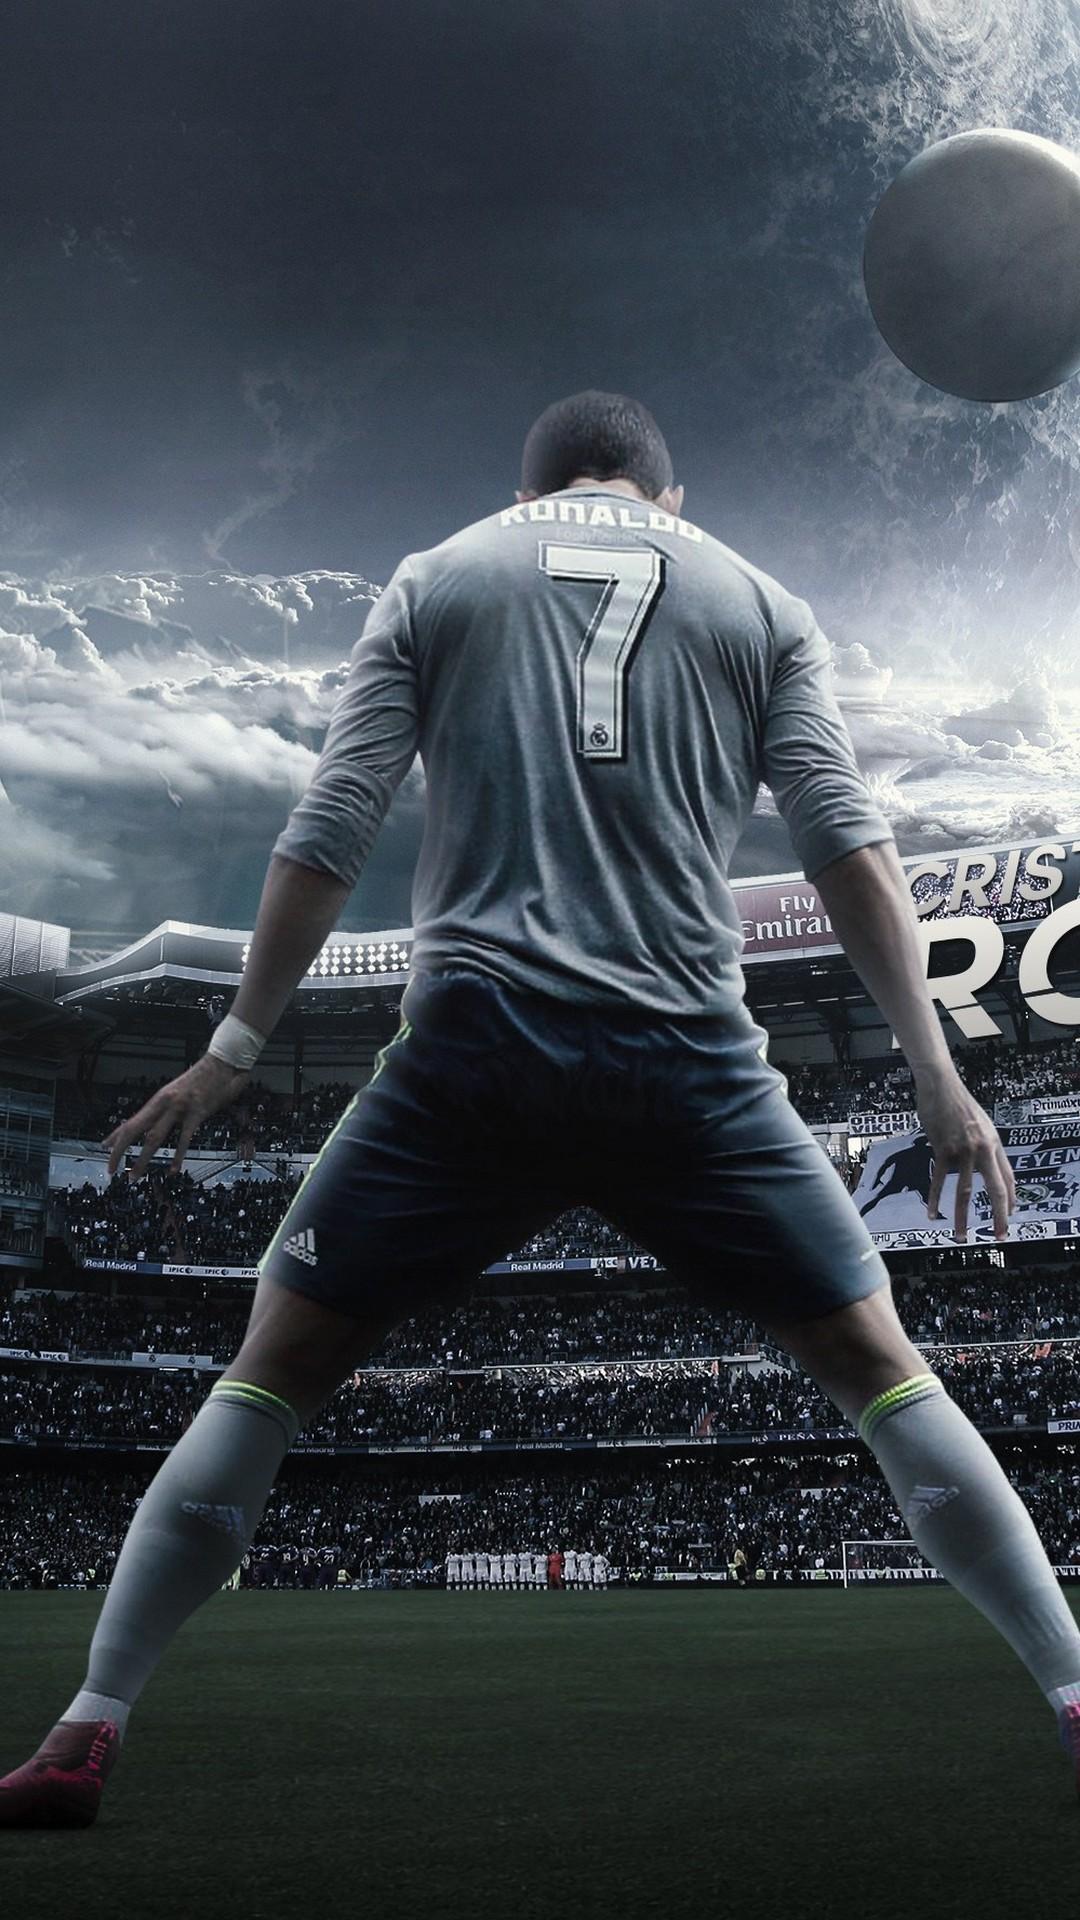 iPhone Wallpaper C Ronaldo Juventus 2020 3D iPhone Wallpaper 1080x1920